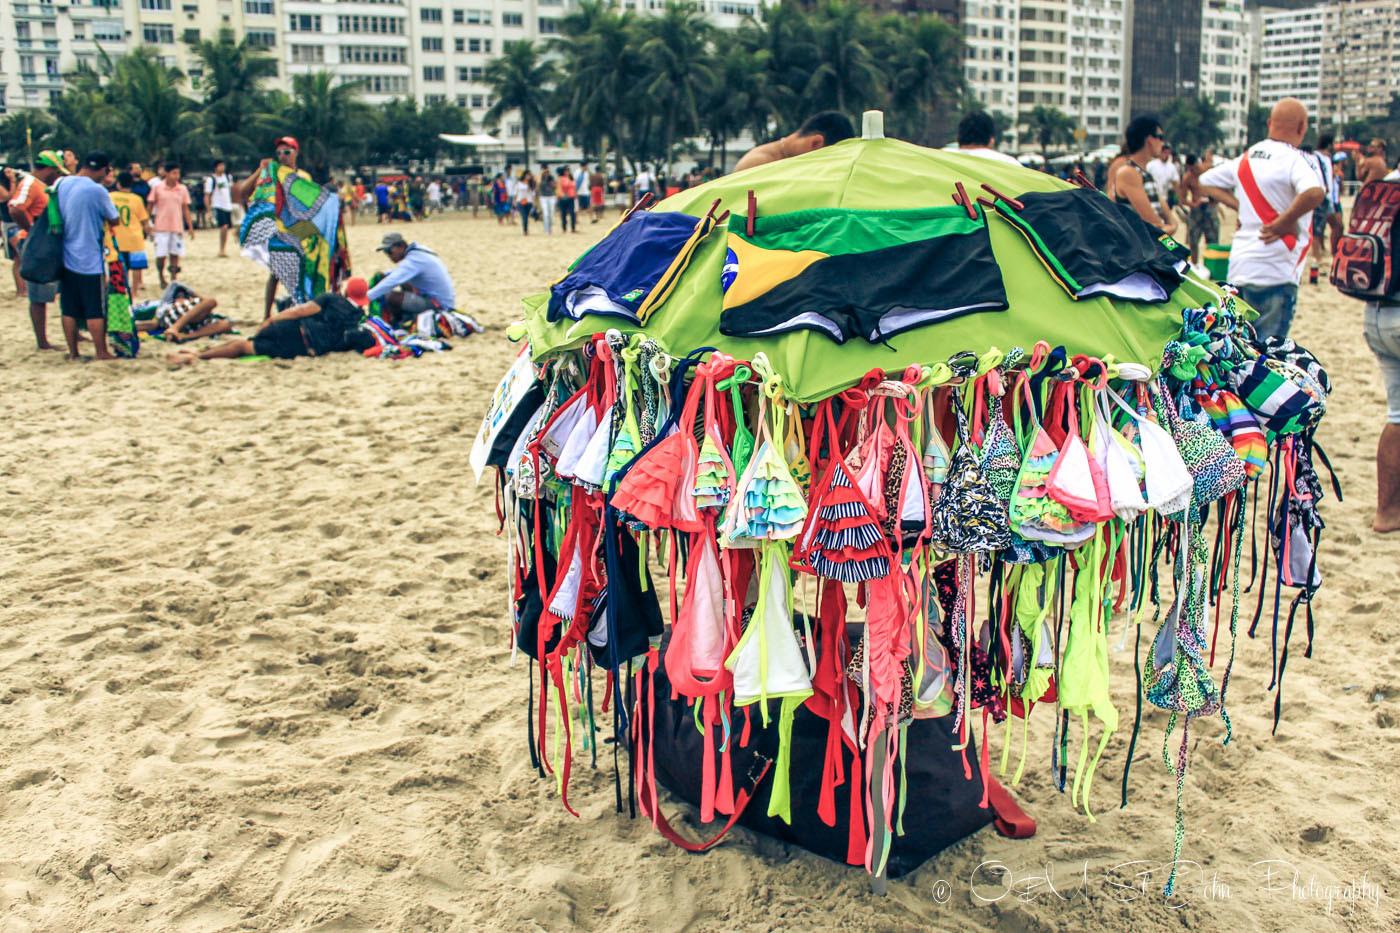 Bathing suit stall on Copacabana Beach, Rio de Janeiro. Brazil